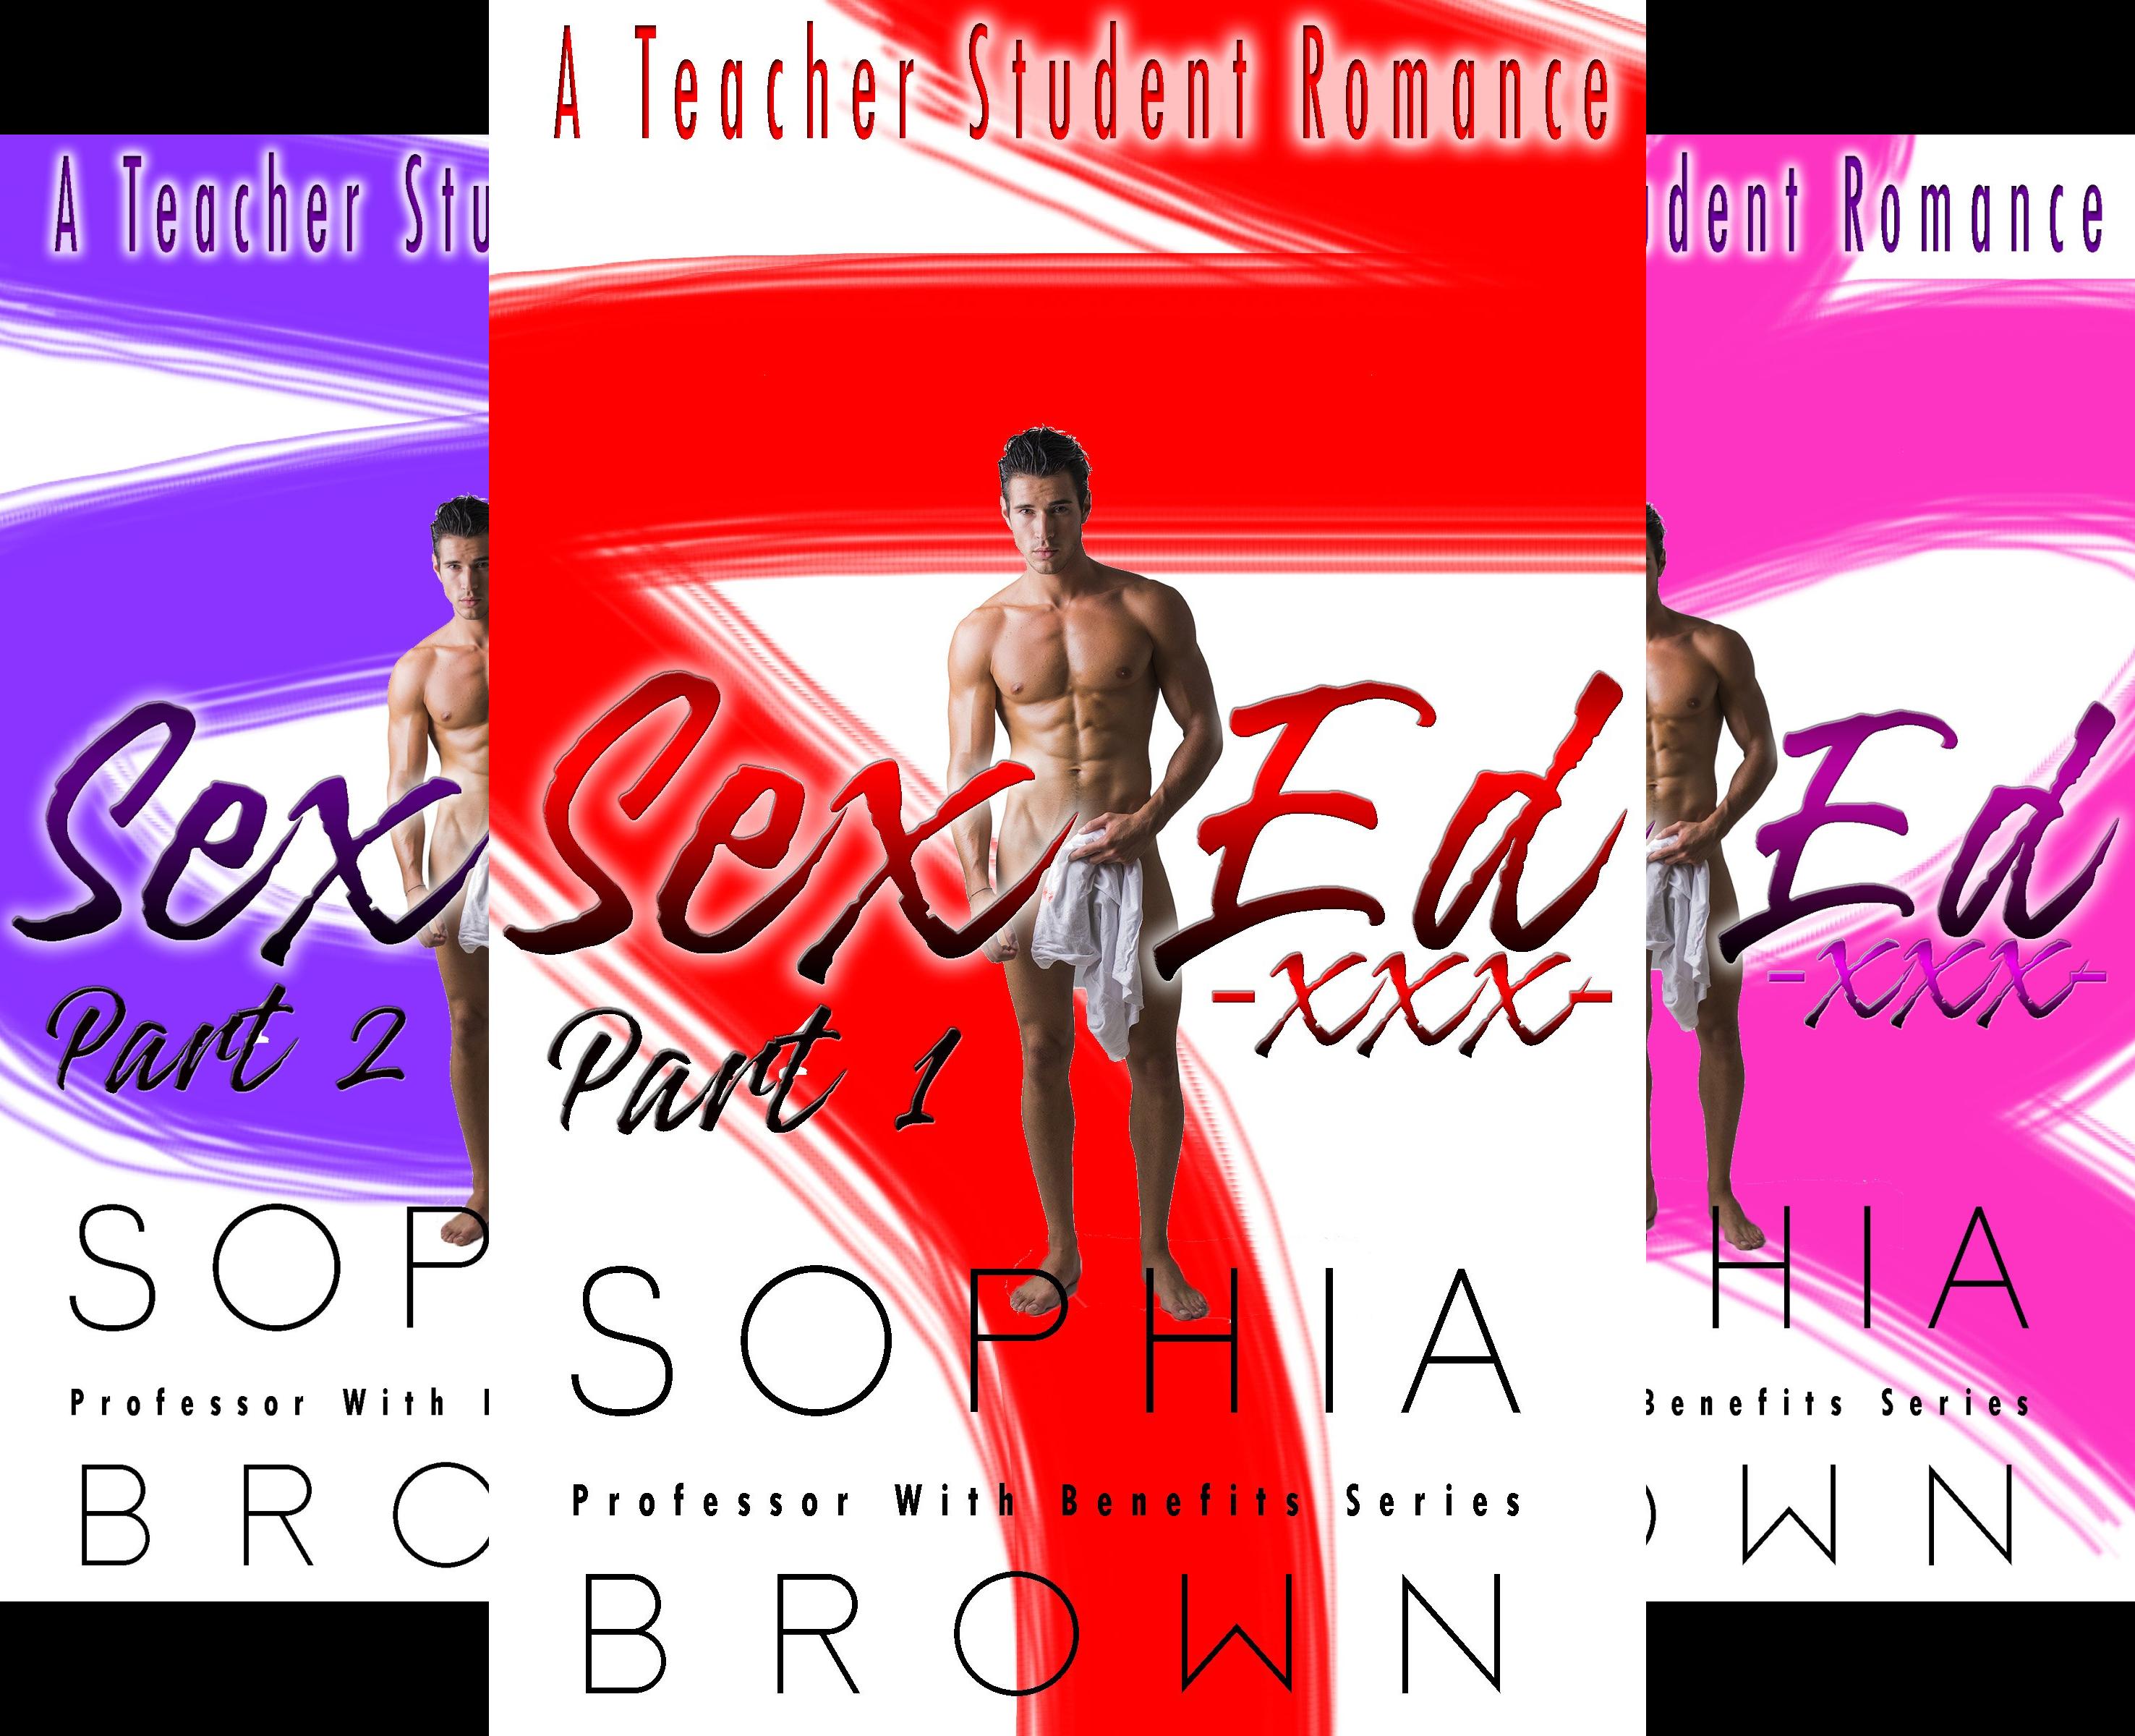 Professor With Benefits Series (3 Book Series)